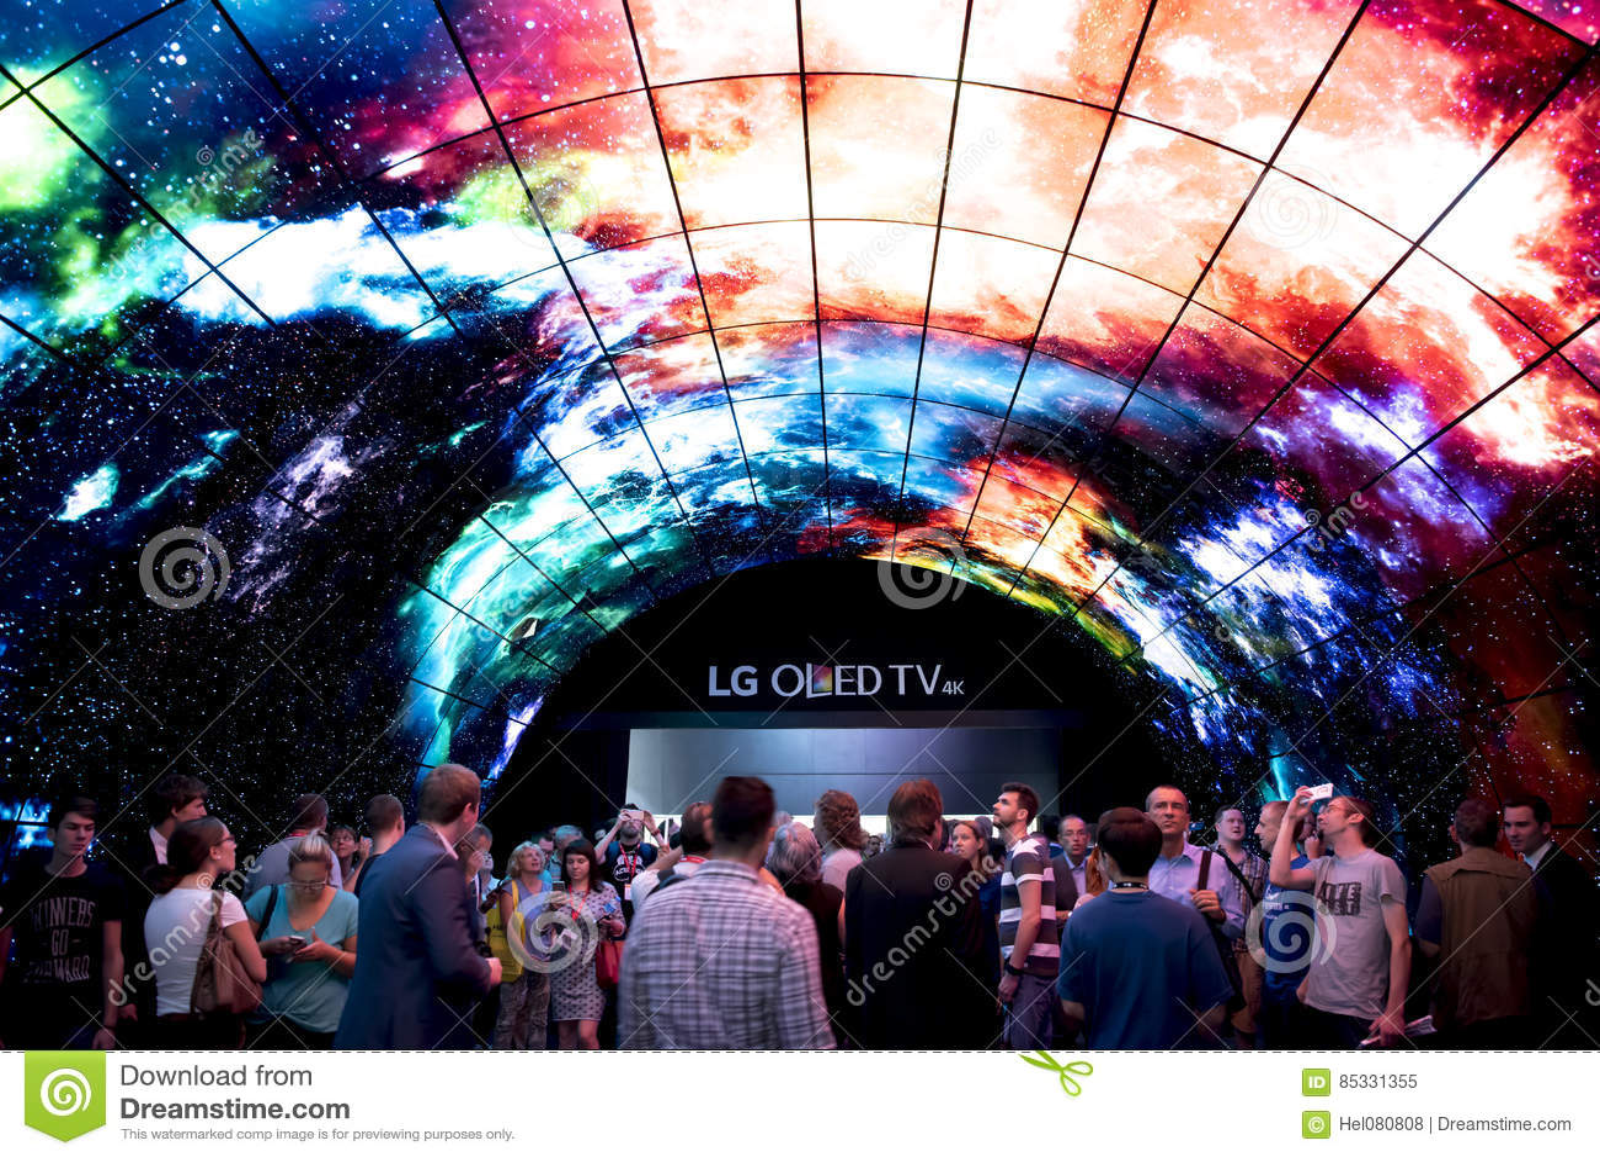 Berlin IFA Fair: Crowds looking at Oled TV